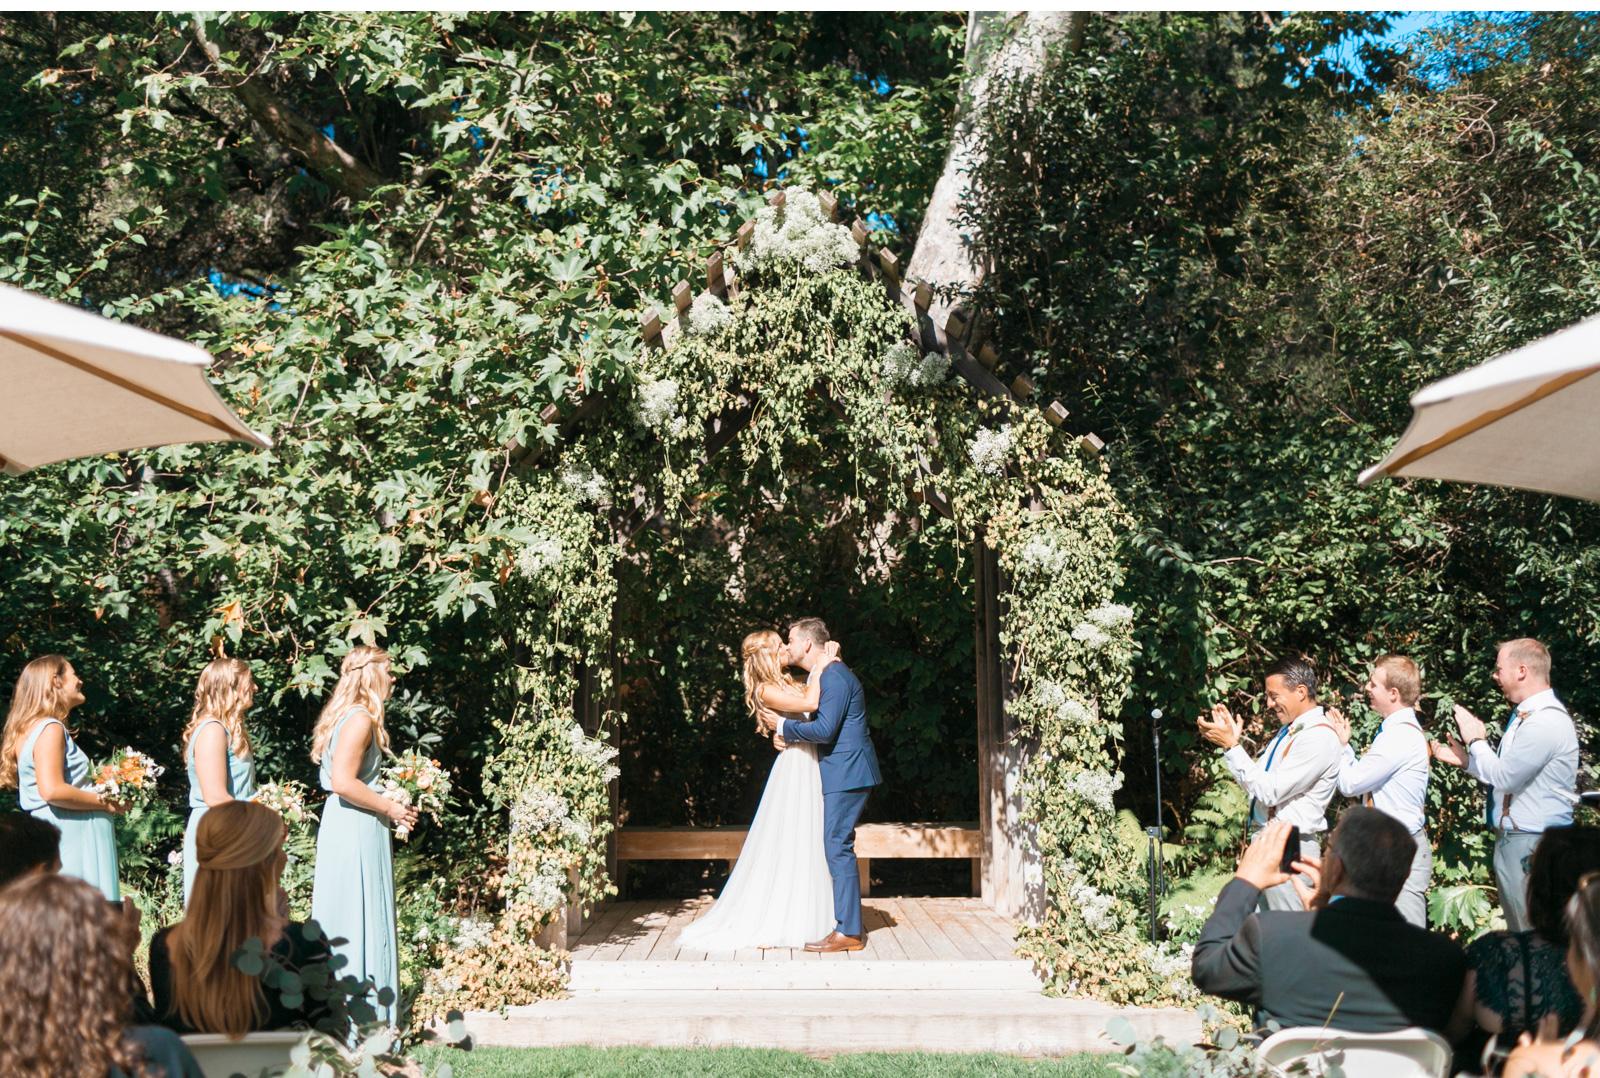 Sea-Canyon-Fruit-Ranch-Wedding-Natalie-Schutt-Photography_06.jpg